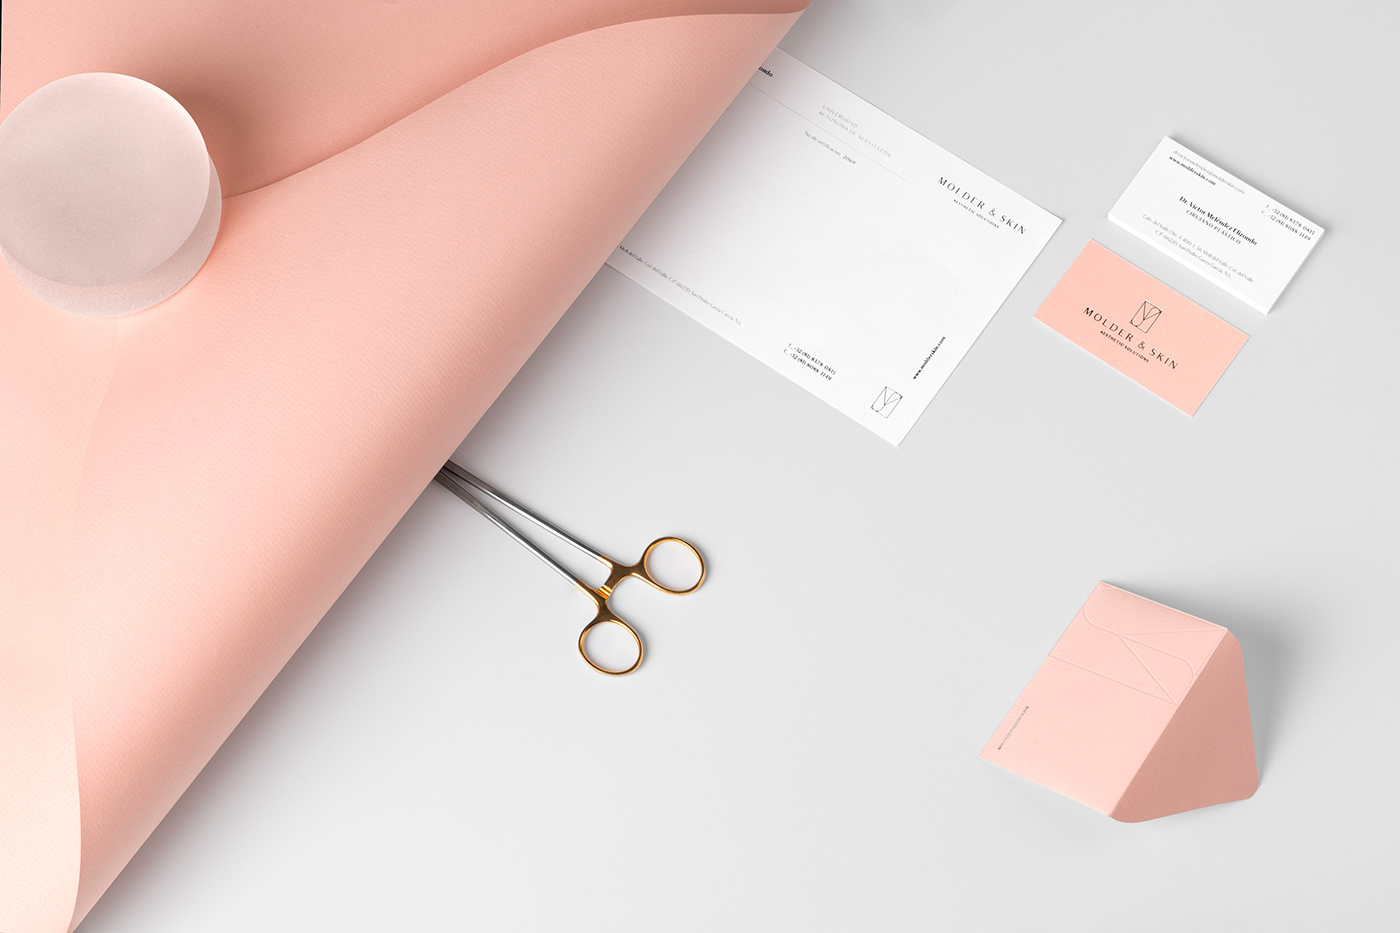 branding  skincare plastic surgery mexico naming animation  monogram medical